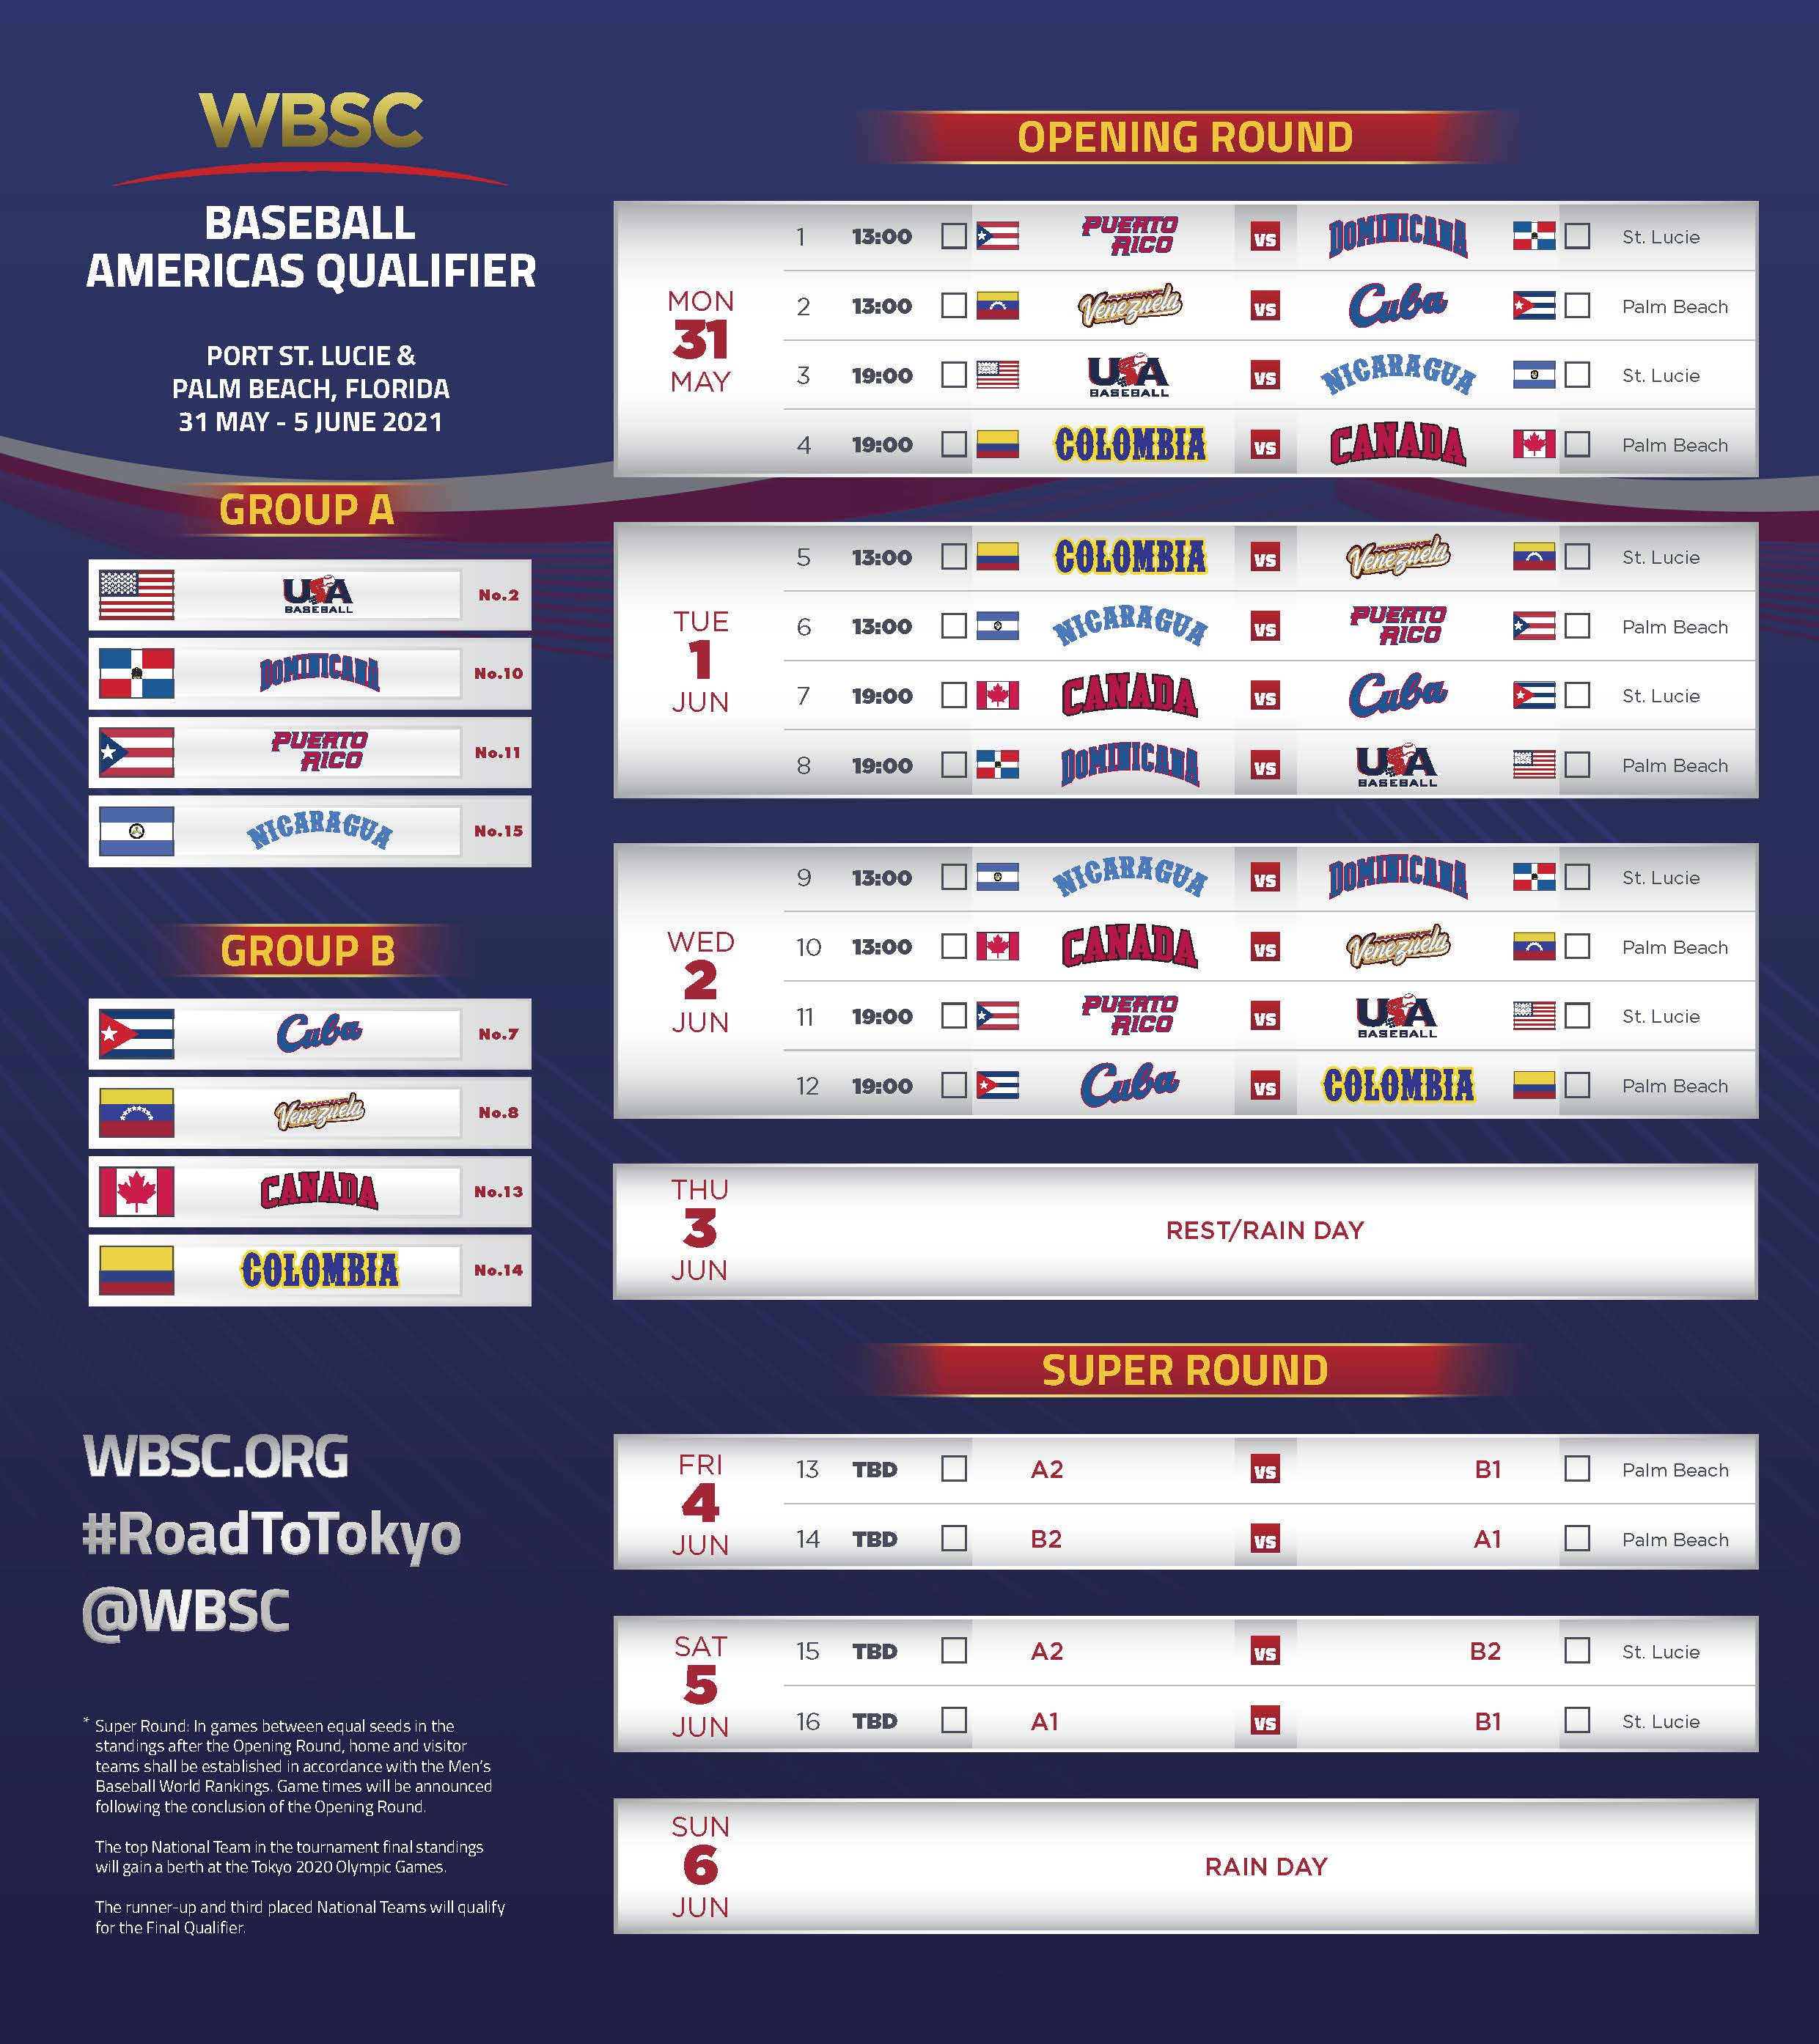 WBSC Baseball Americas Qualifier Schedule